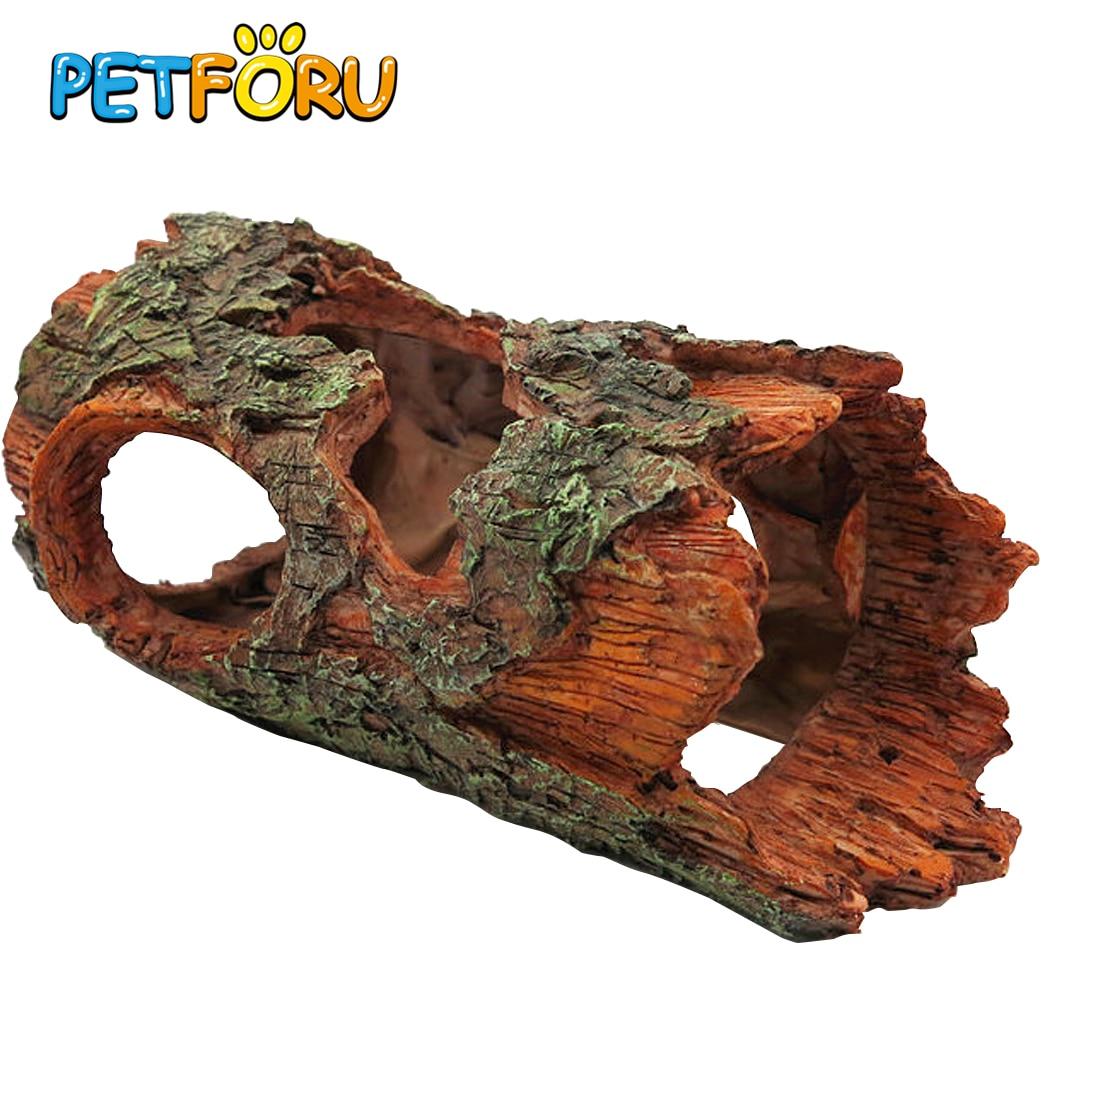 Petforu 23.5*14*10.5CM Simulation Resin Tree Bark Hiding Cave Reptile Aquarium Habitat Landscaping Ornament